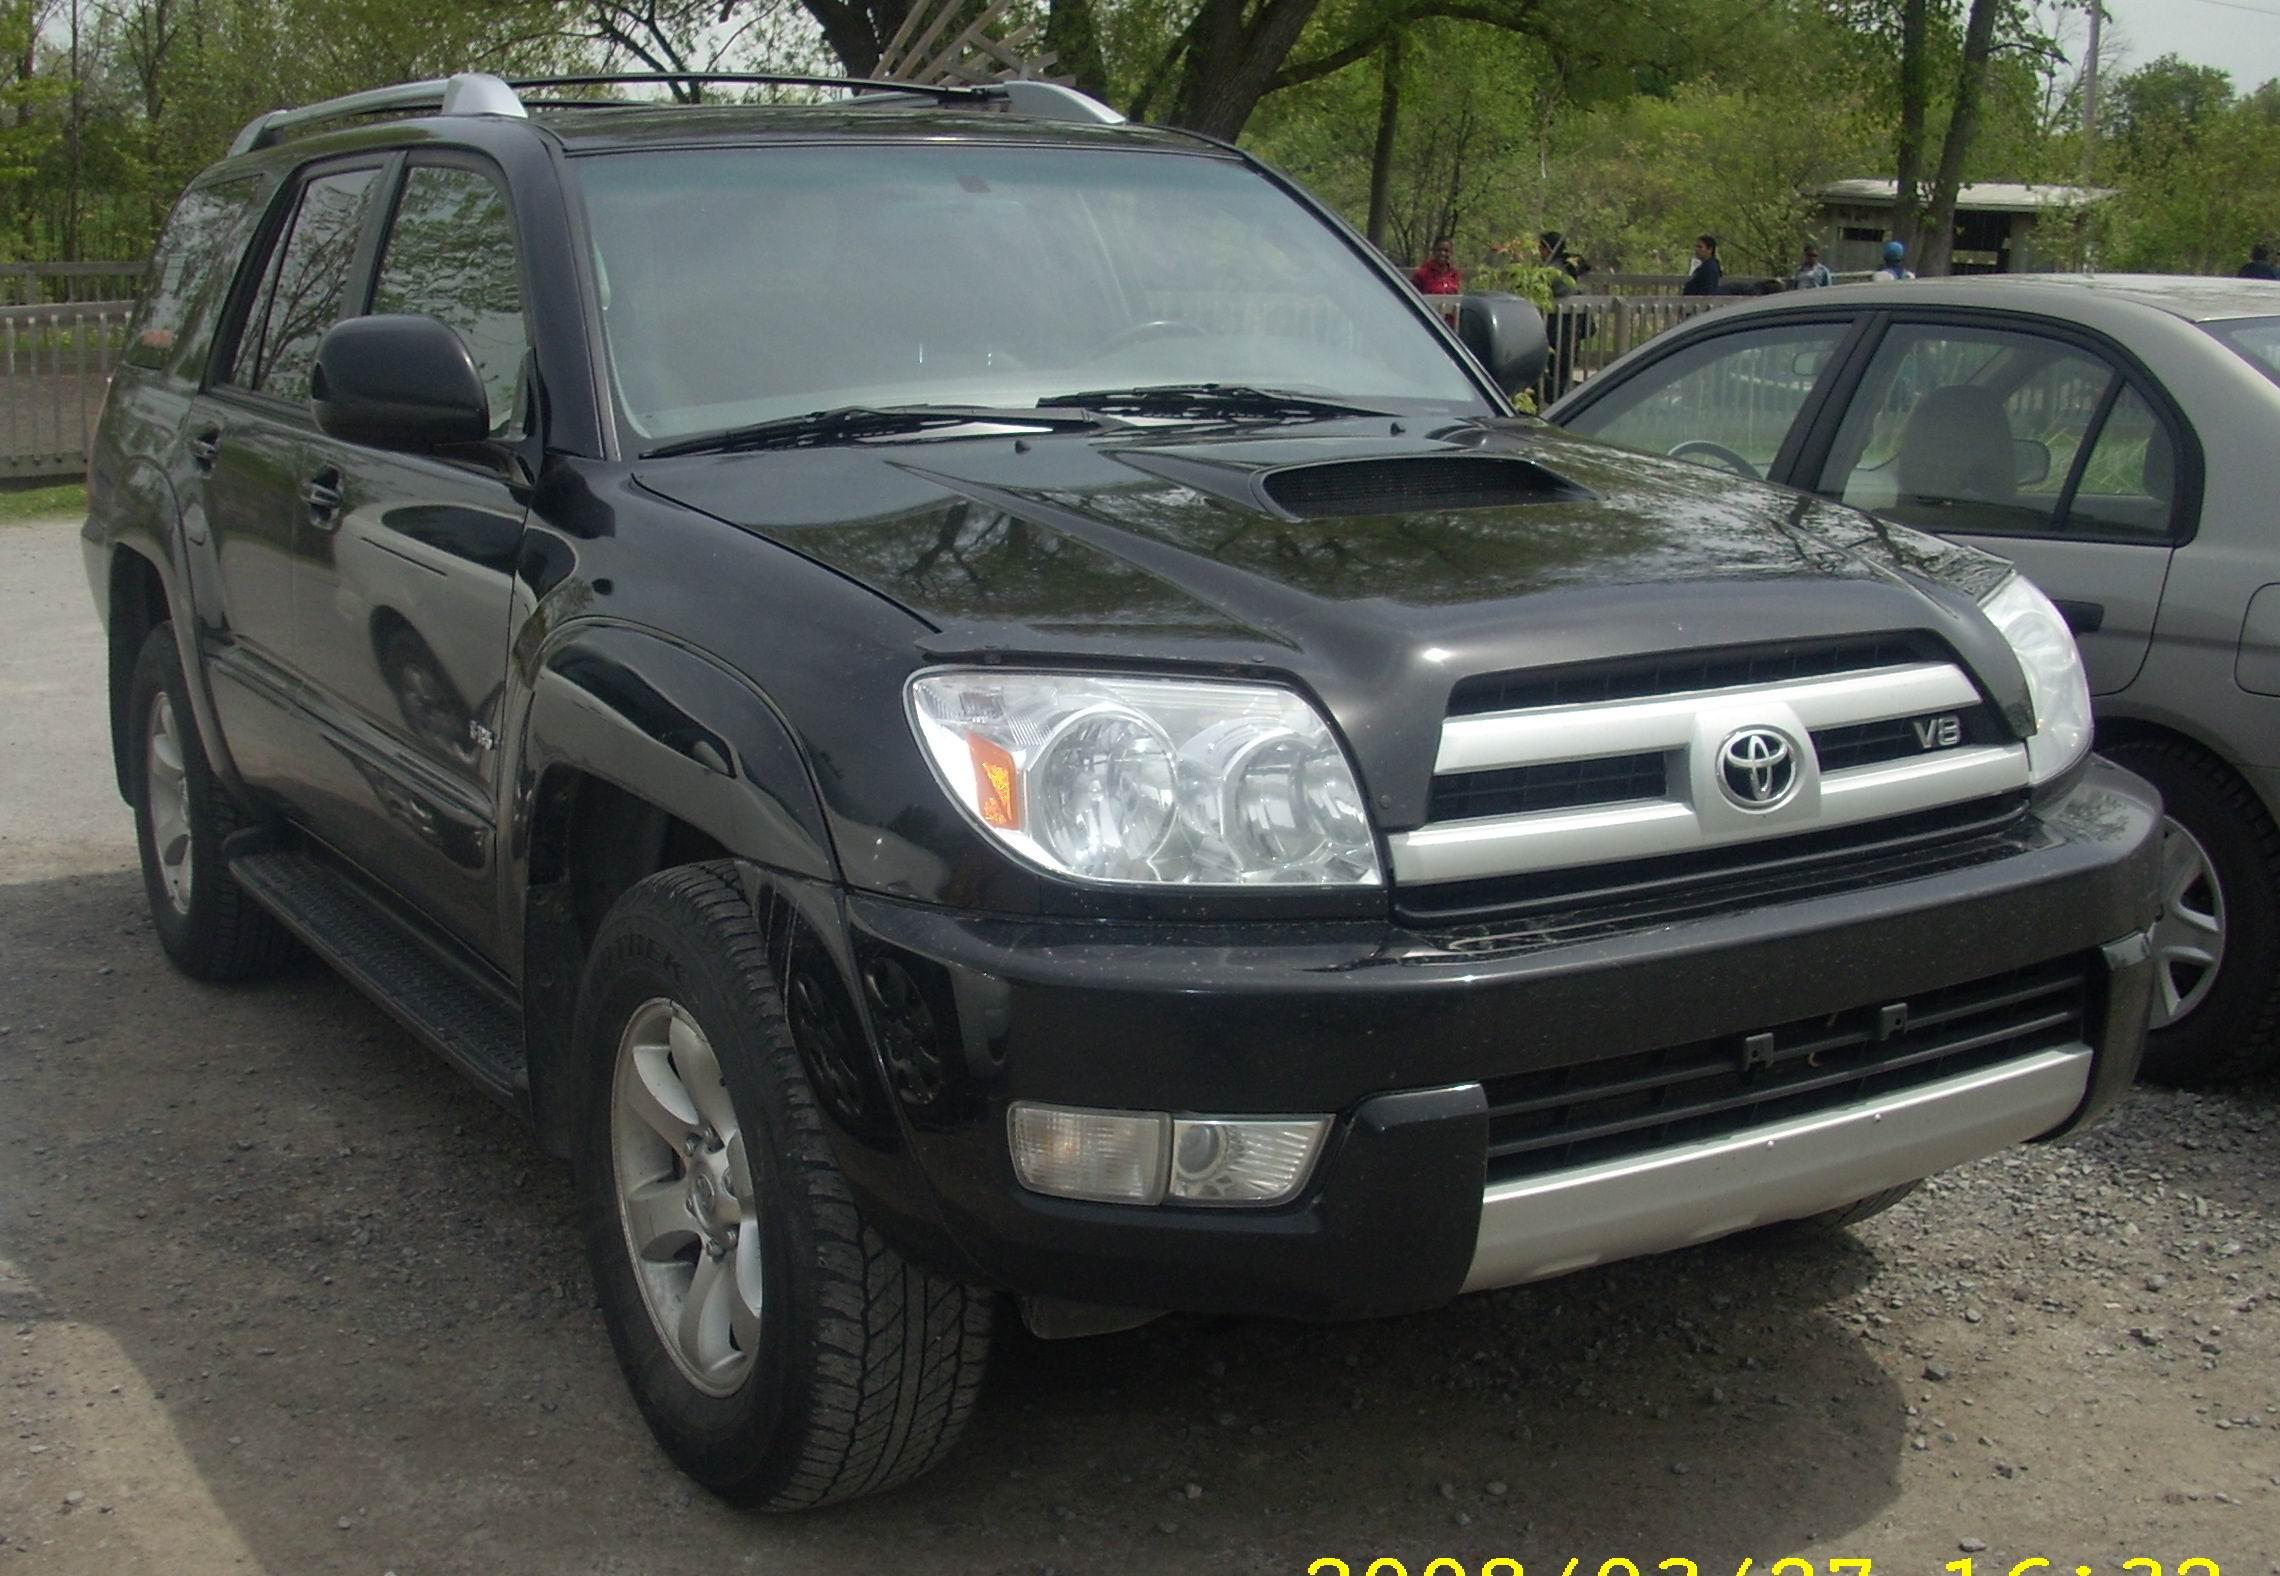 2005 Toyota 4runner Image 16